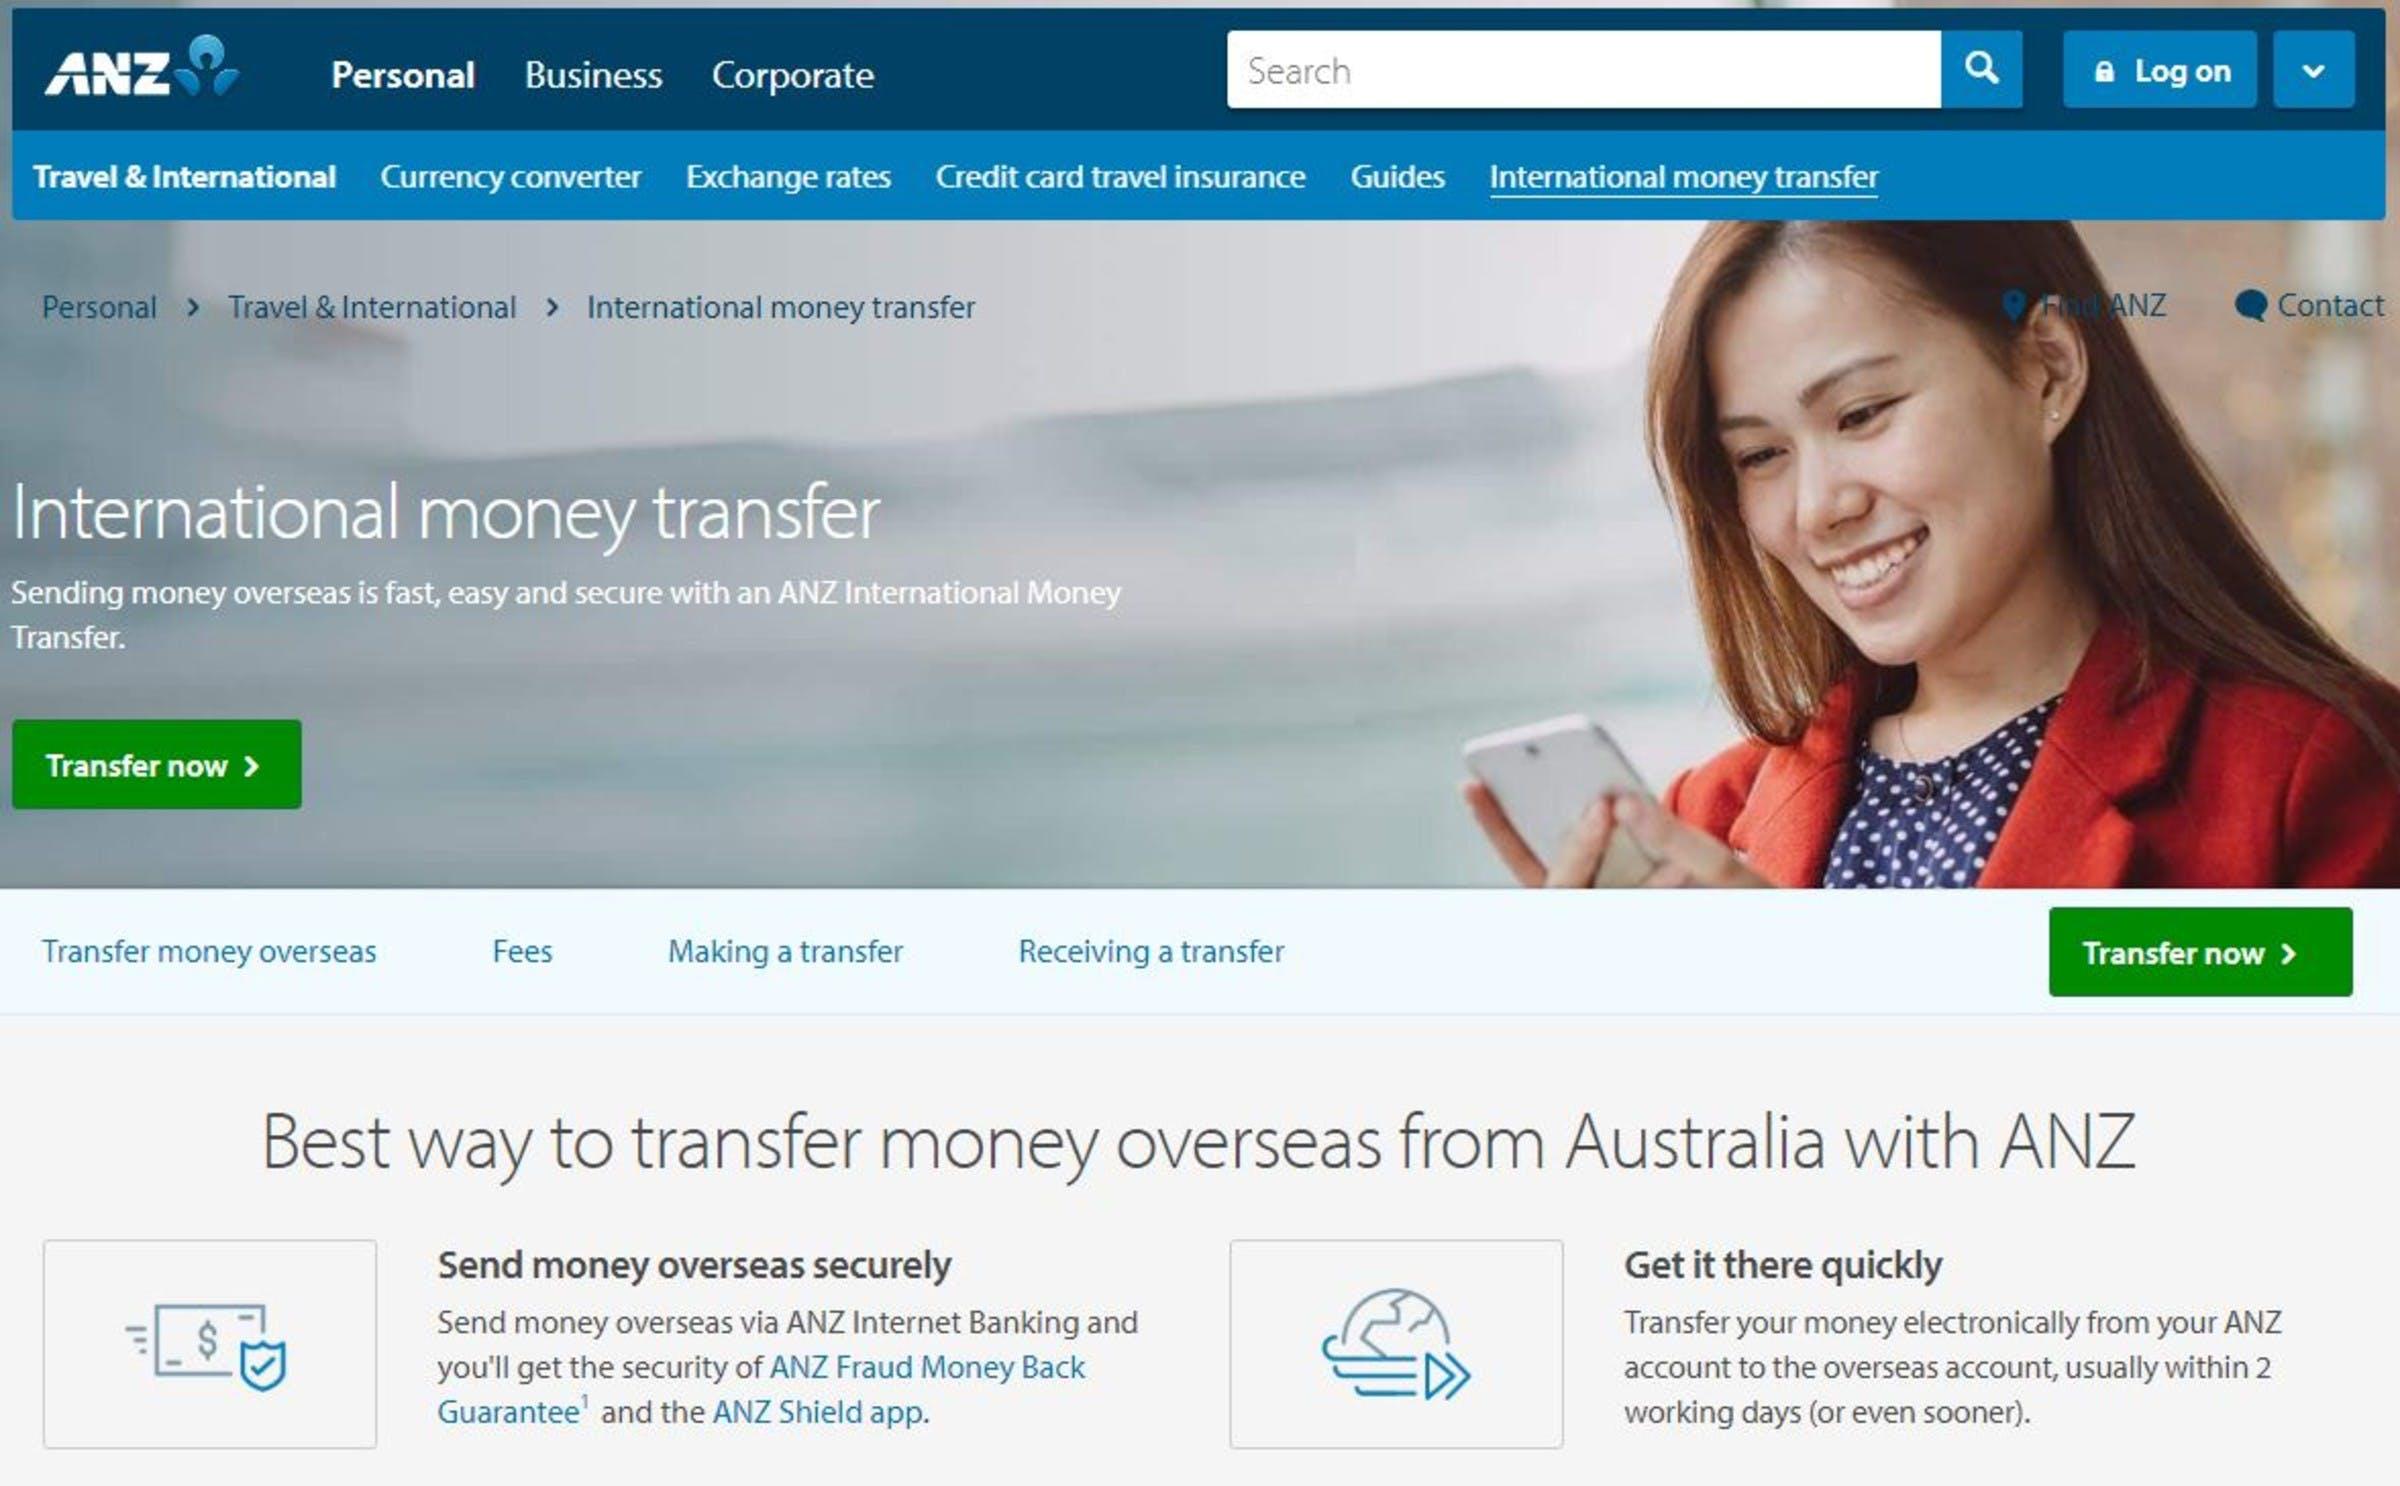 anz international money transfer exchange rate